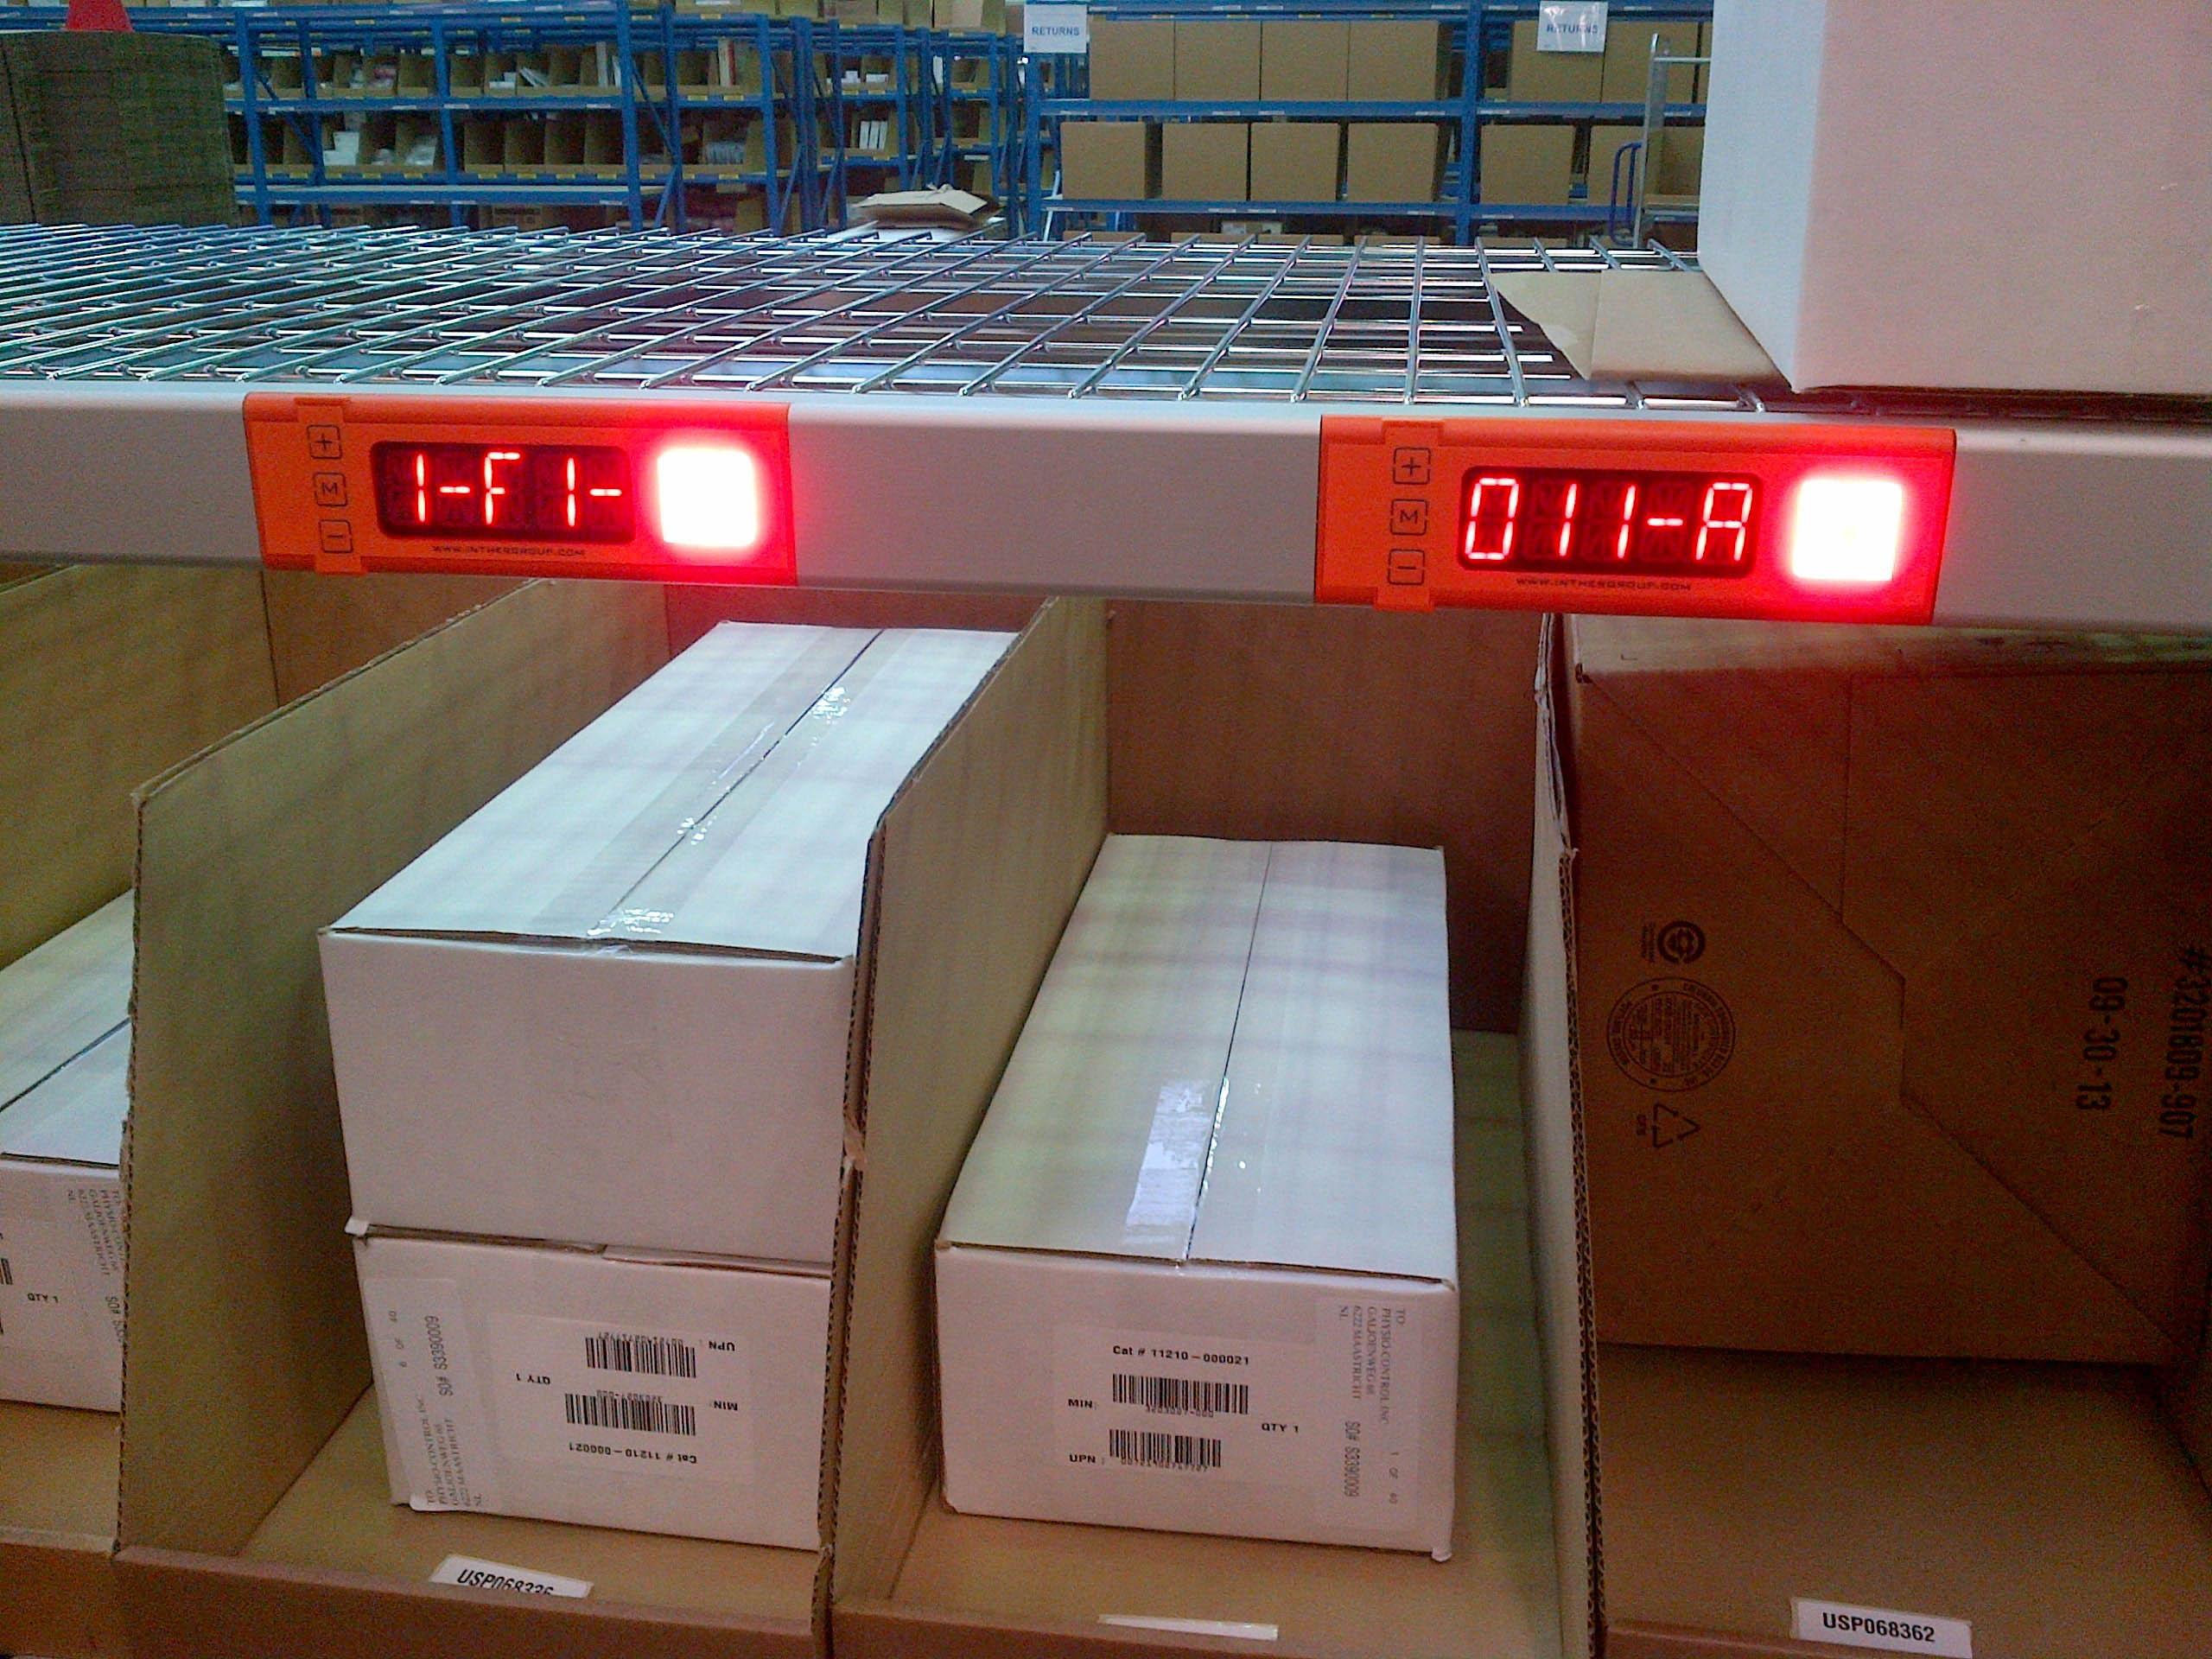 U0027Pick To Light Cartsu0027 Set To Improve Order Productivity